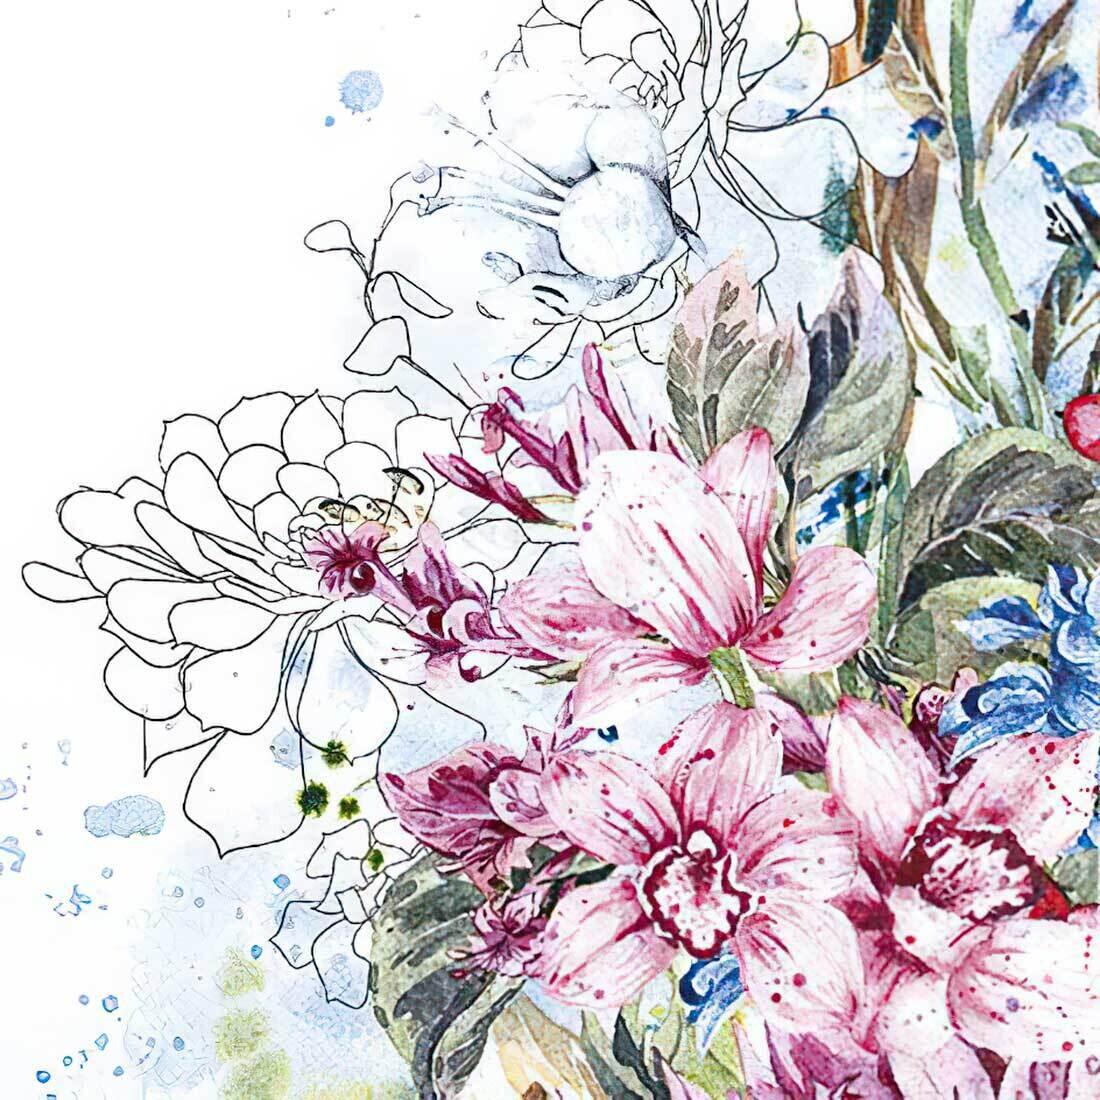 Decoupage Paper Napkins - Floral - Tropical Orchid (1 Sheet)